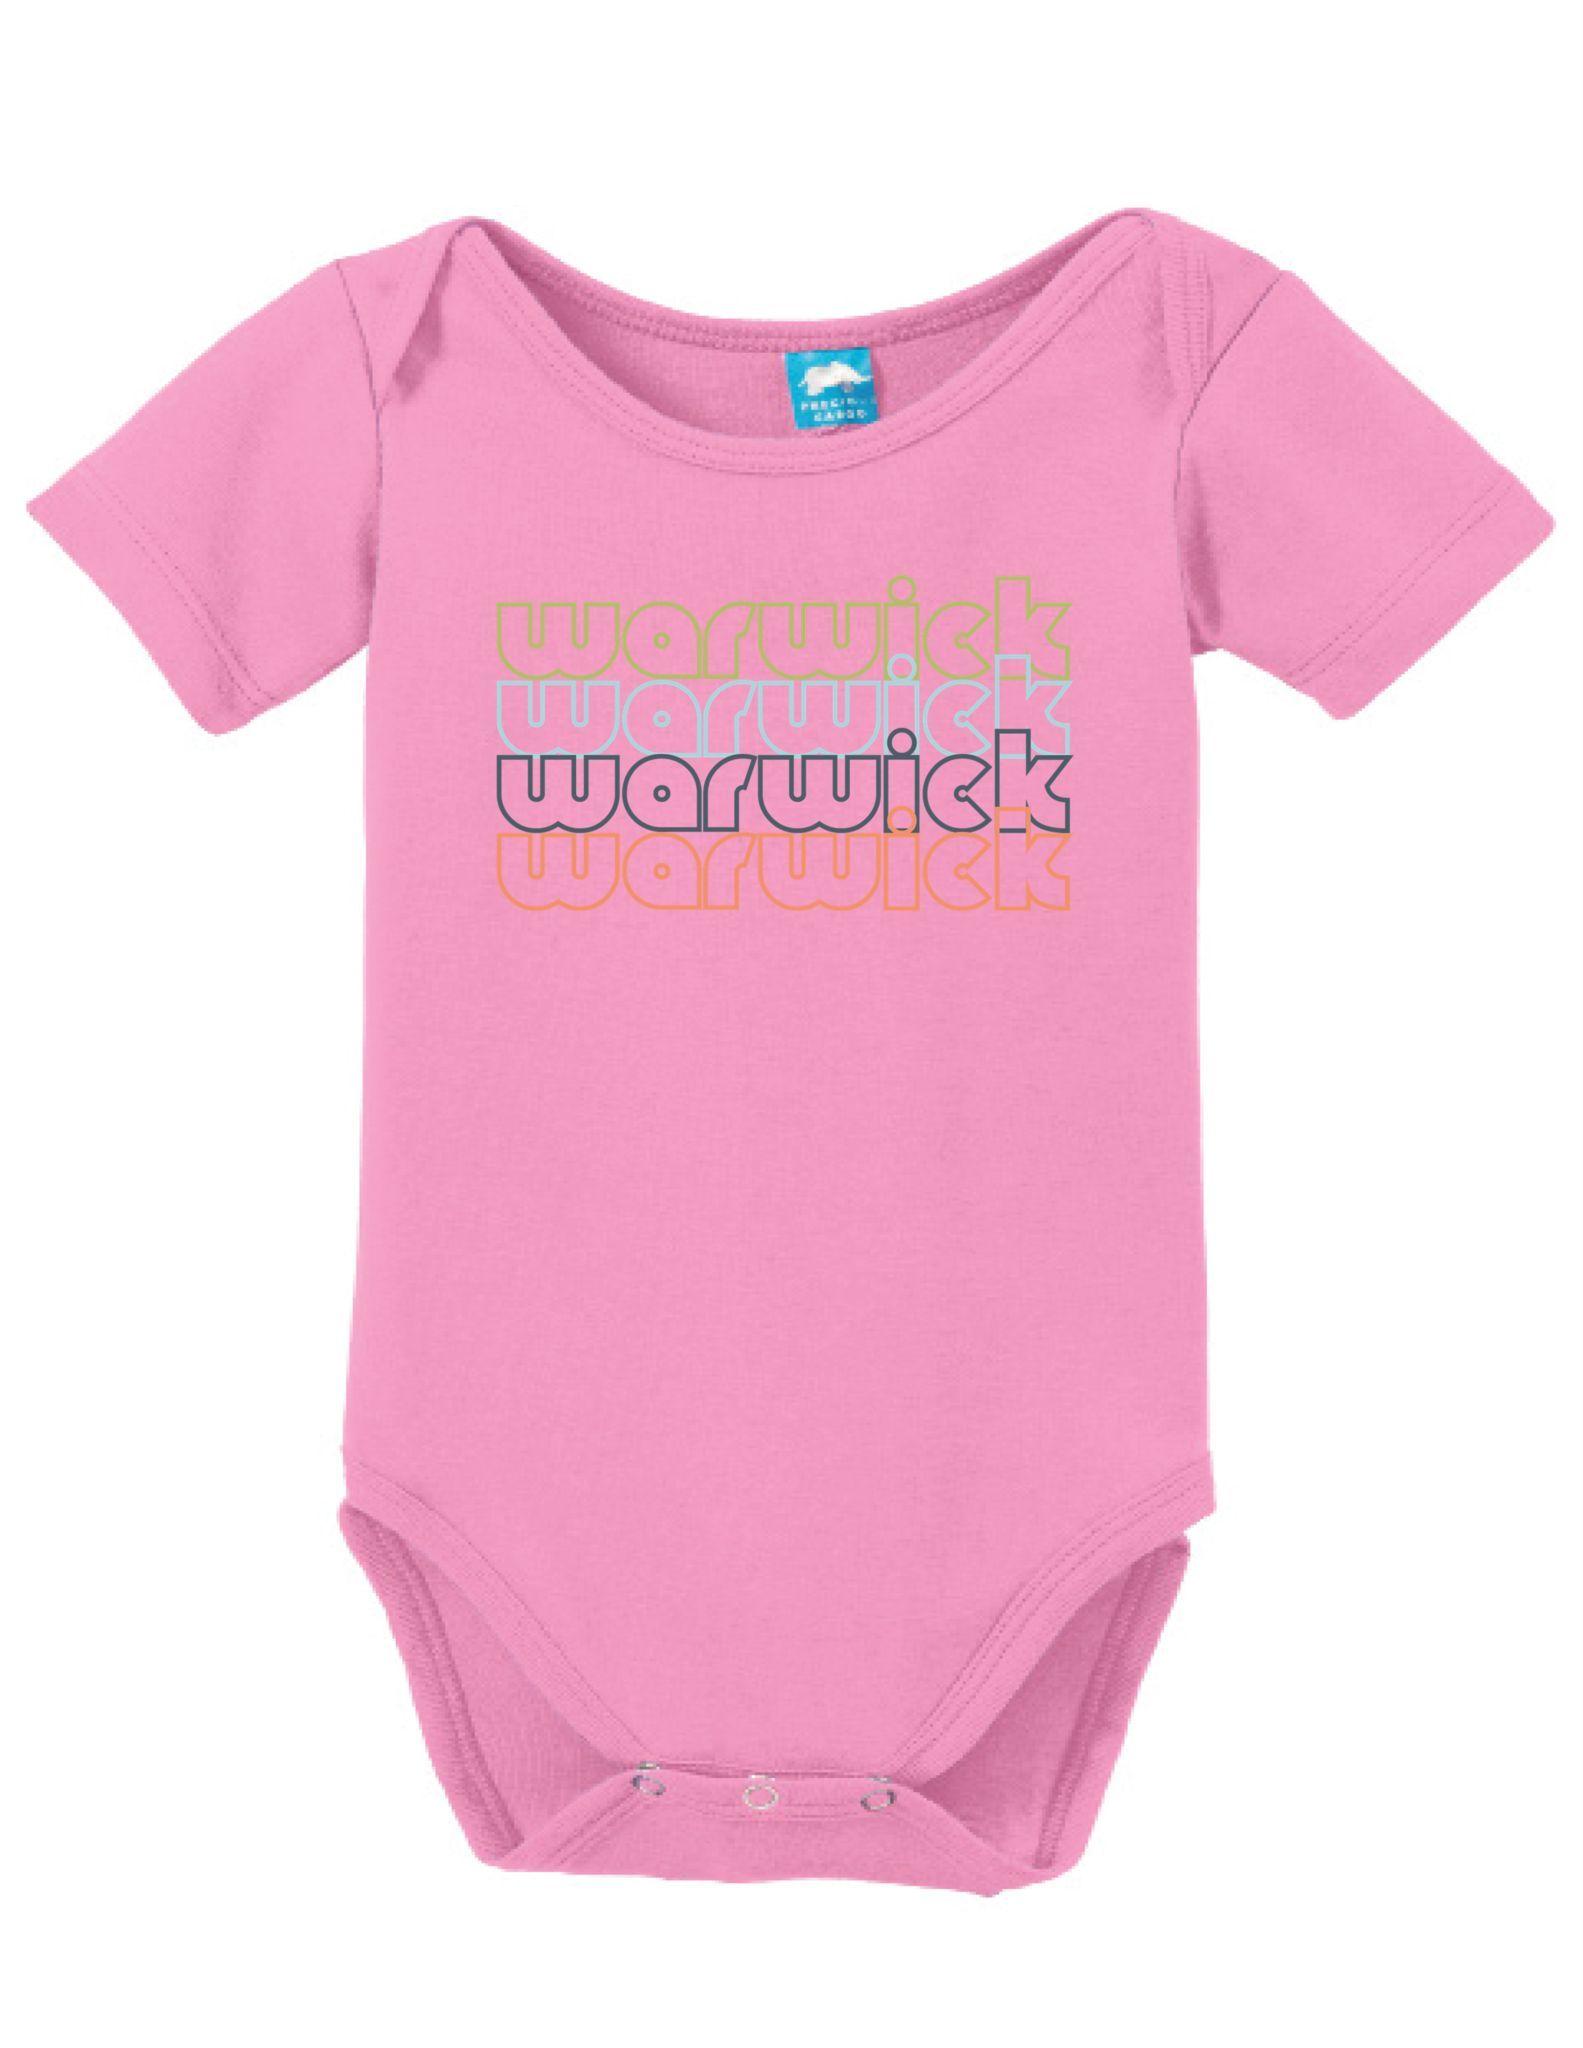 Warwick Rhode Island Retro Onesie Funny Bodysuit Baby Romper